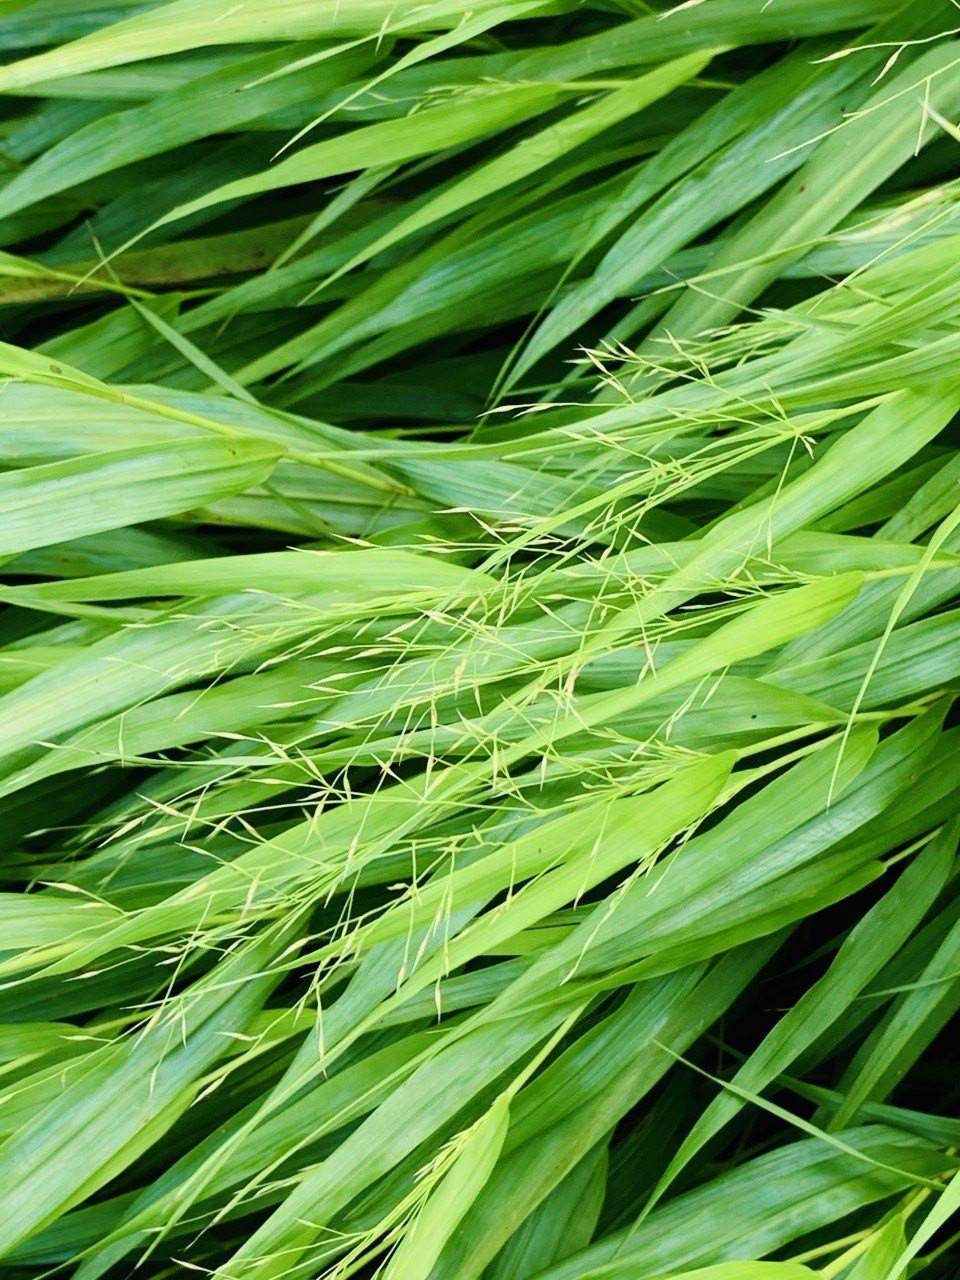 Linear long leaves of Hakonechola grass